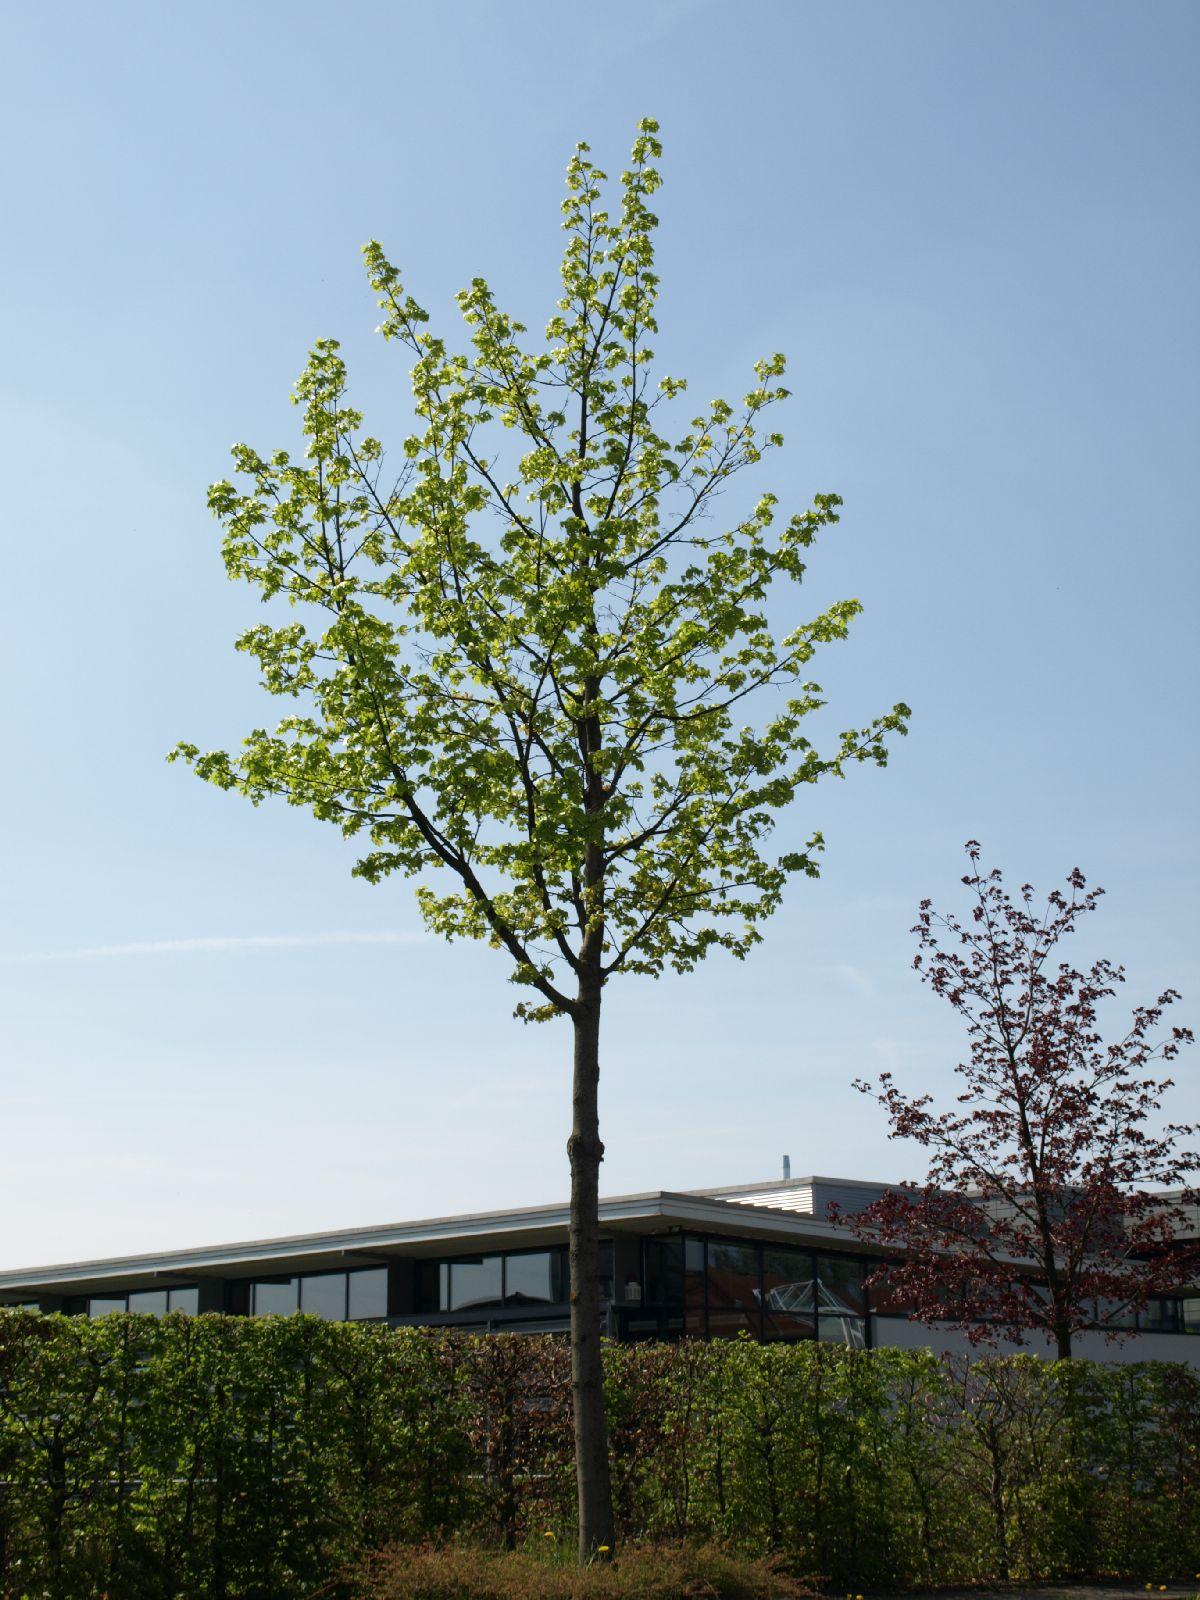 Pflanzen-Baum-Foto_Textur_B_P5042435